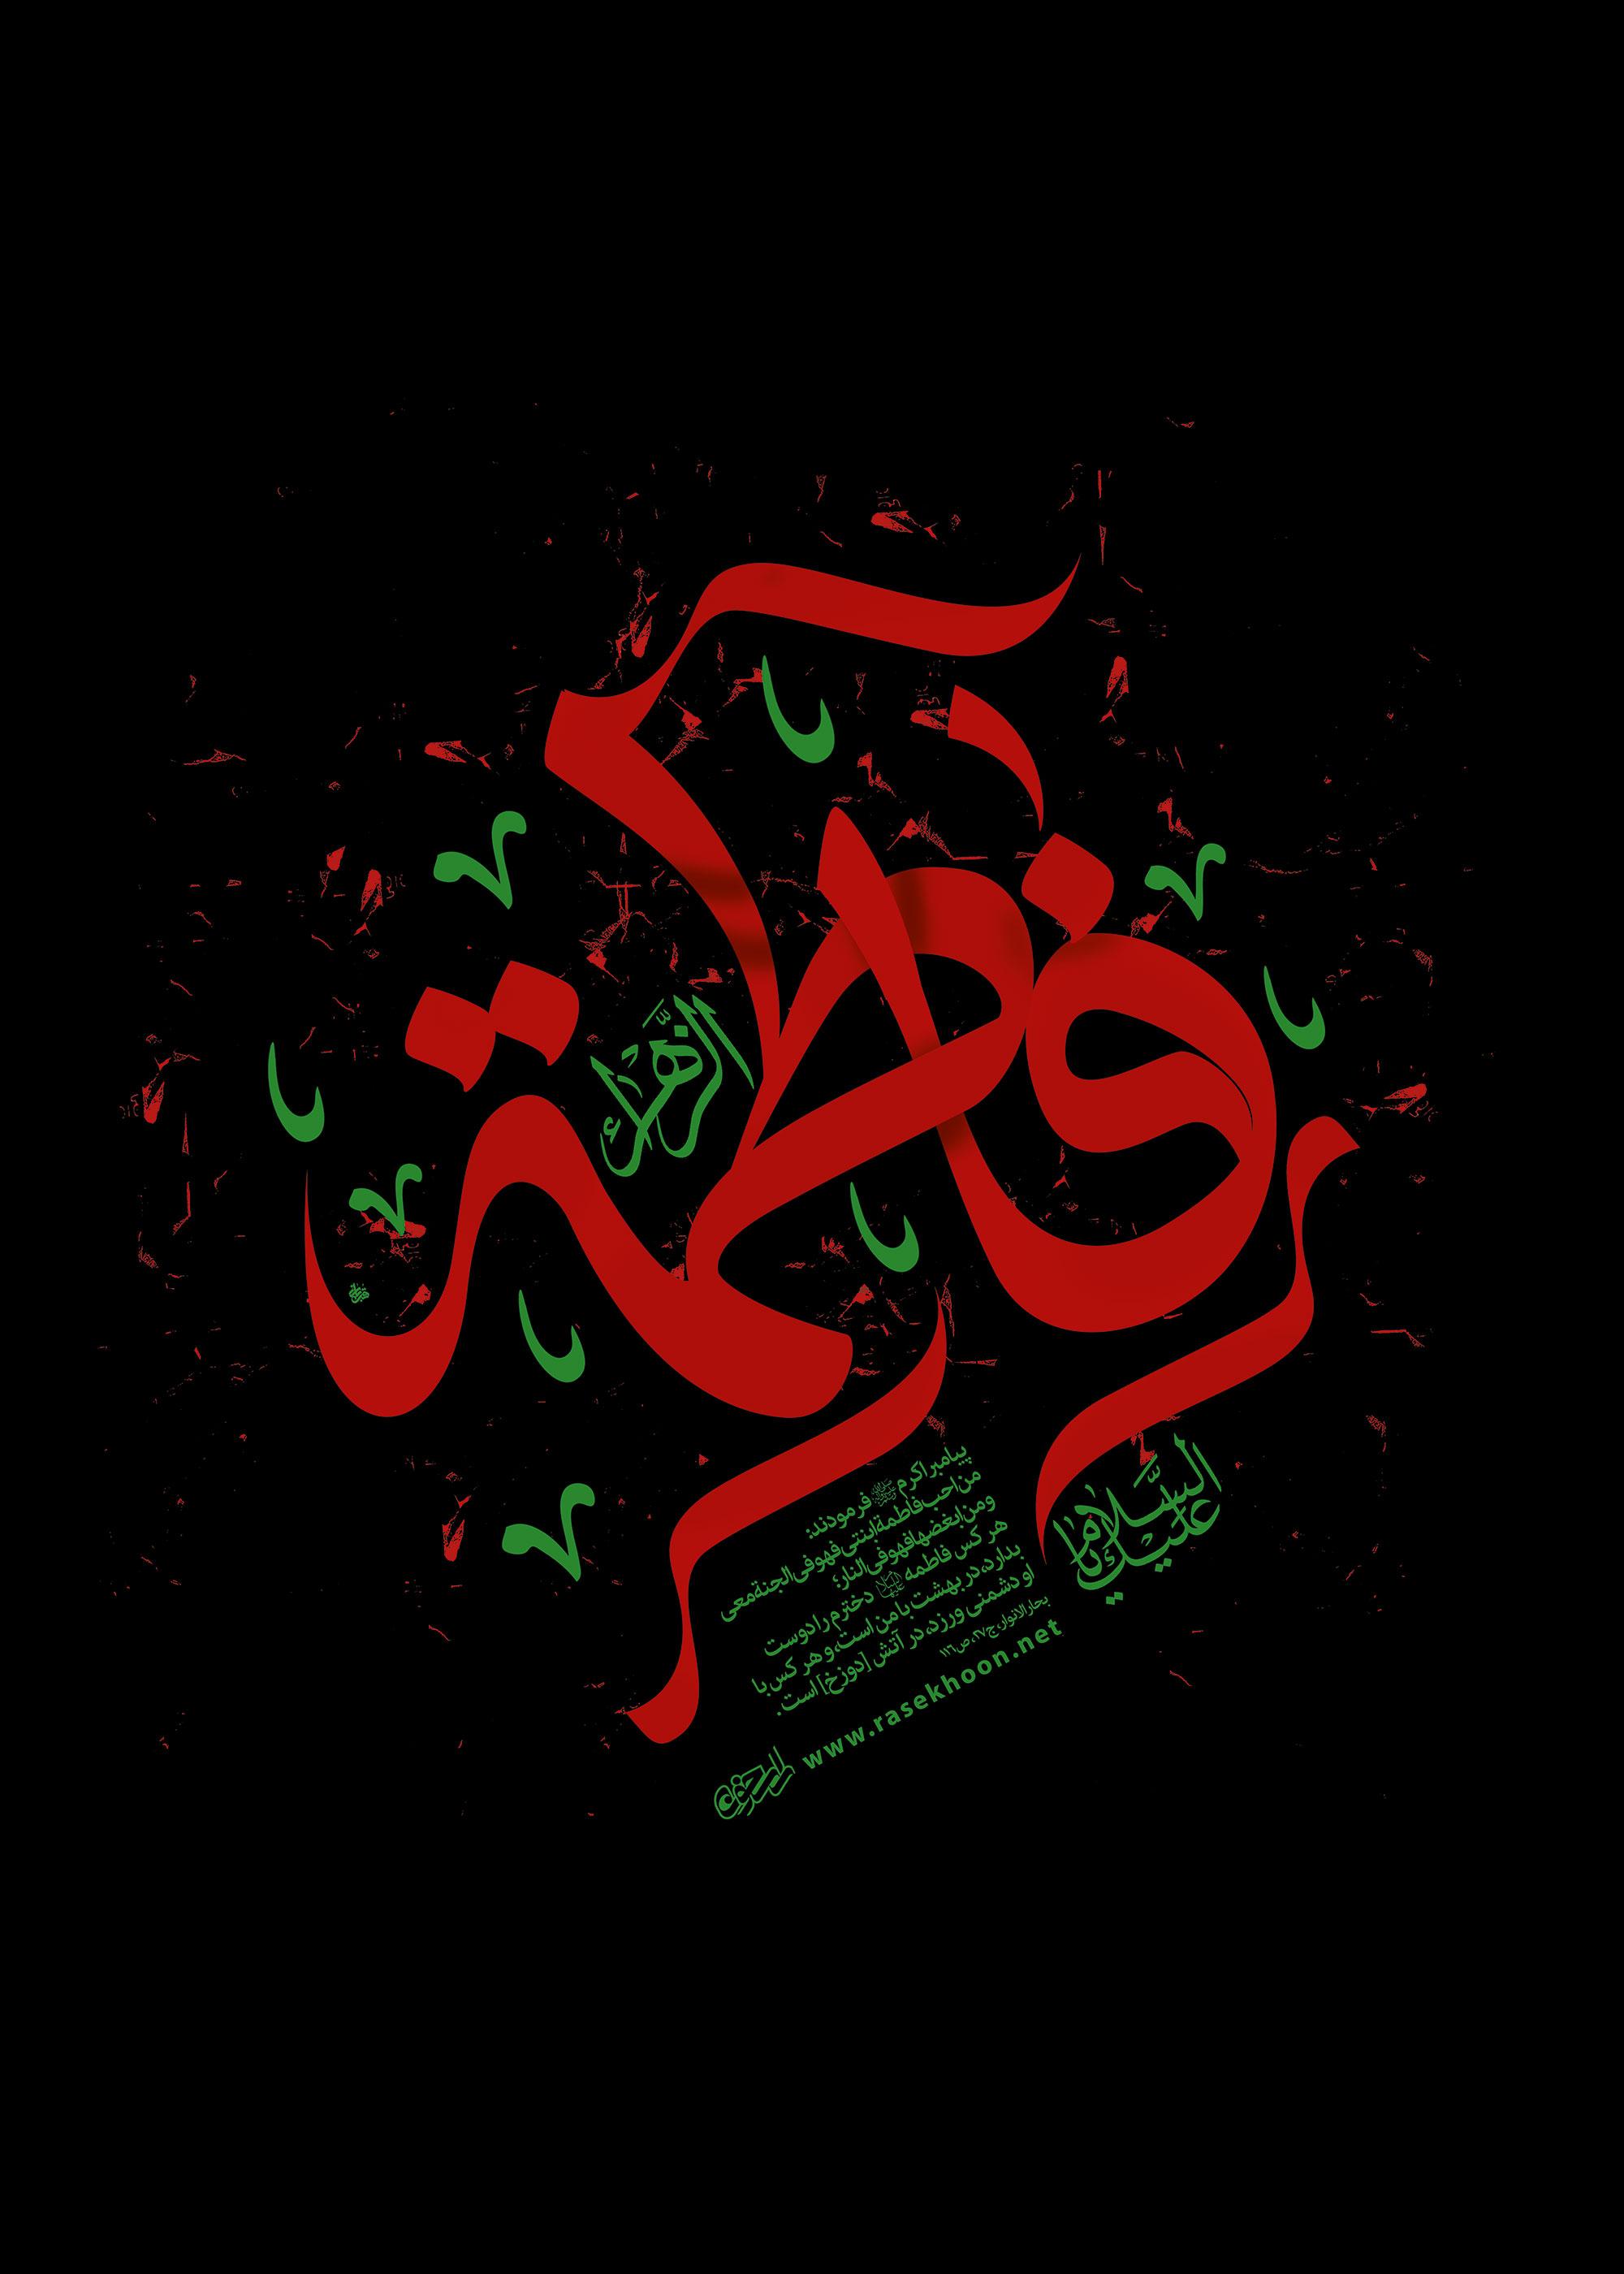 پوستر شهادت حضرت زهرا سلام الله علیها